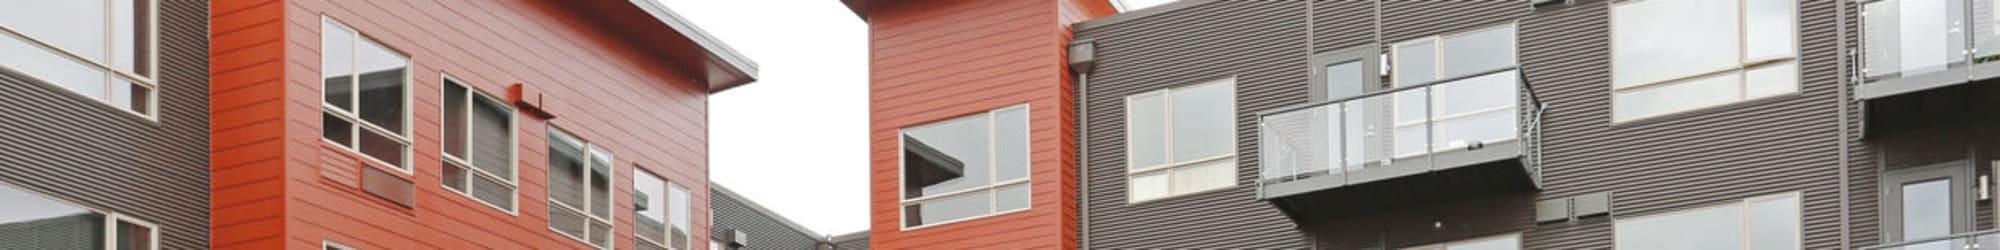 Virtual tours of South Block Apartments in Salem, Oregon